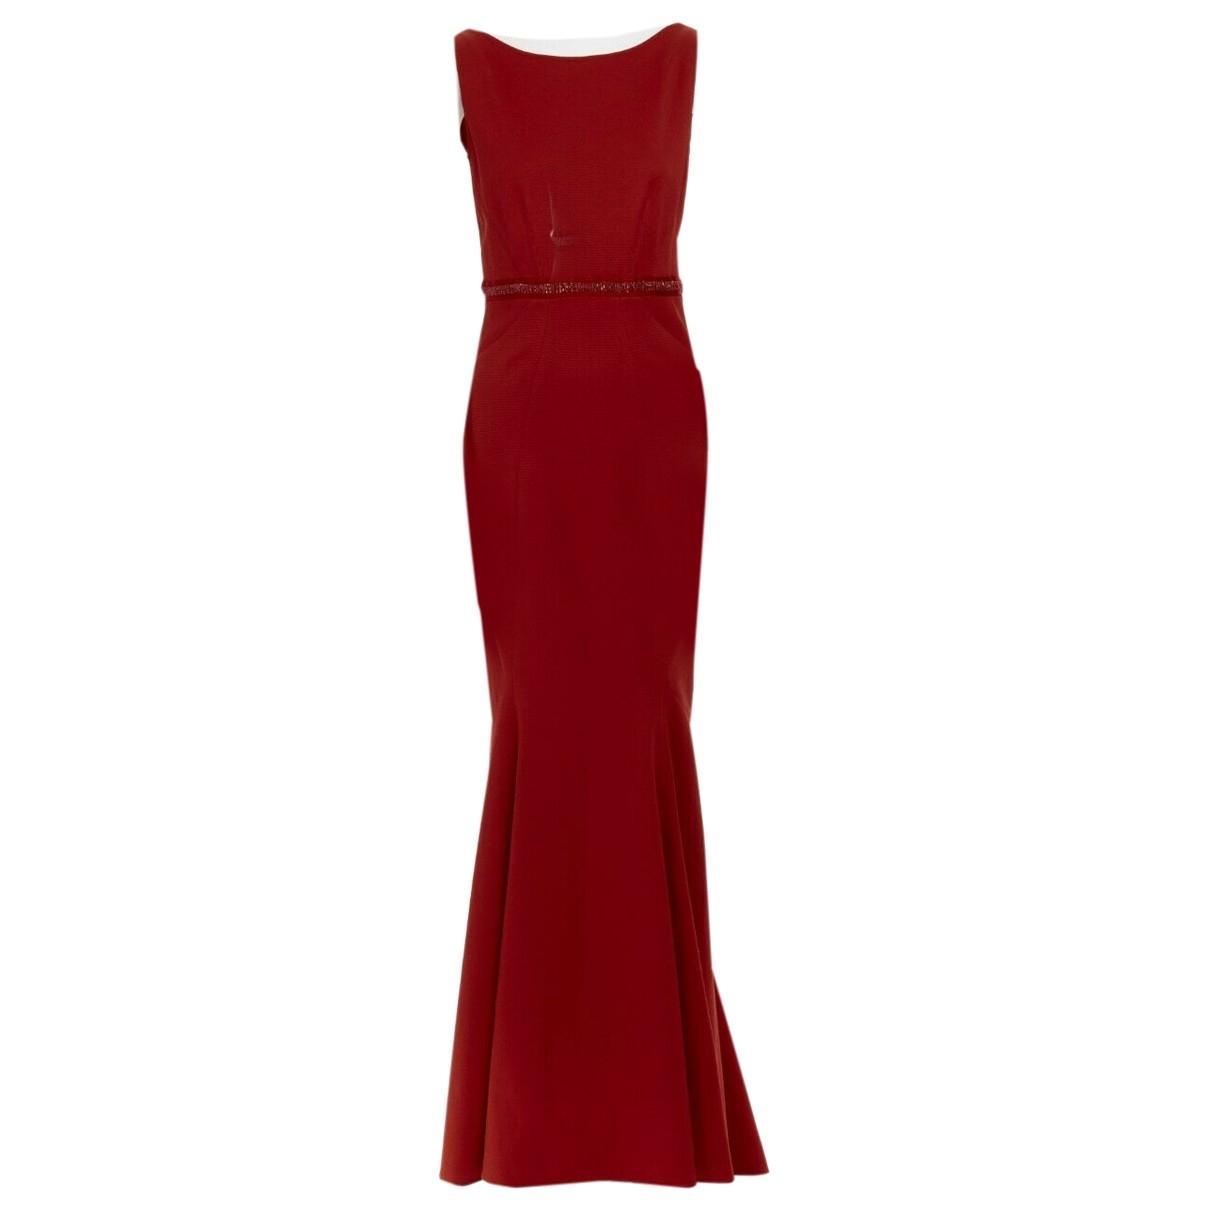 Zac Posen \N Red Cotton dress for Women 6 US